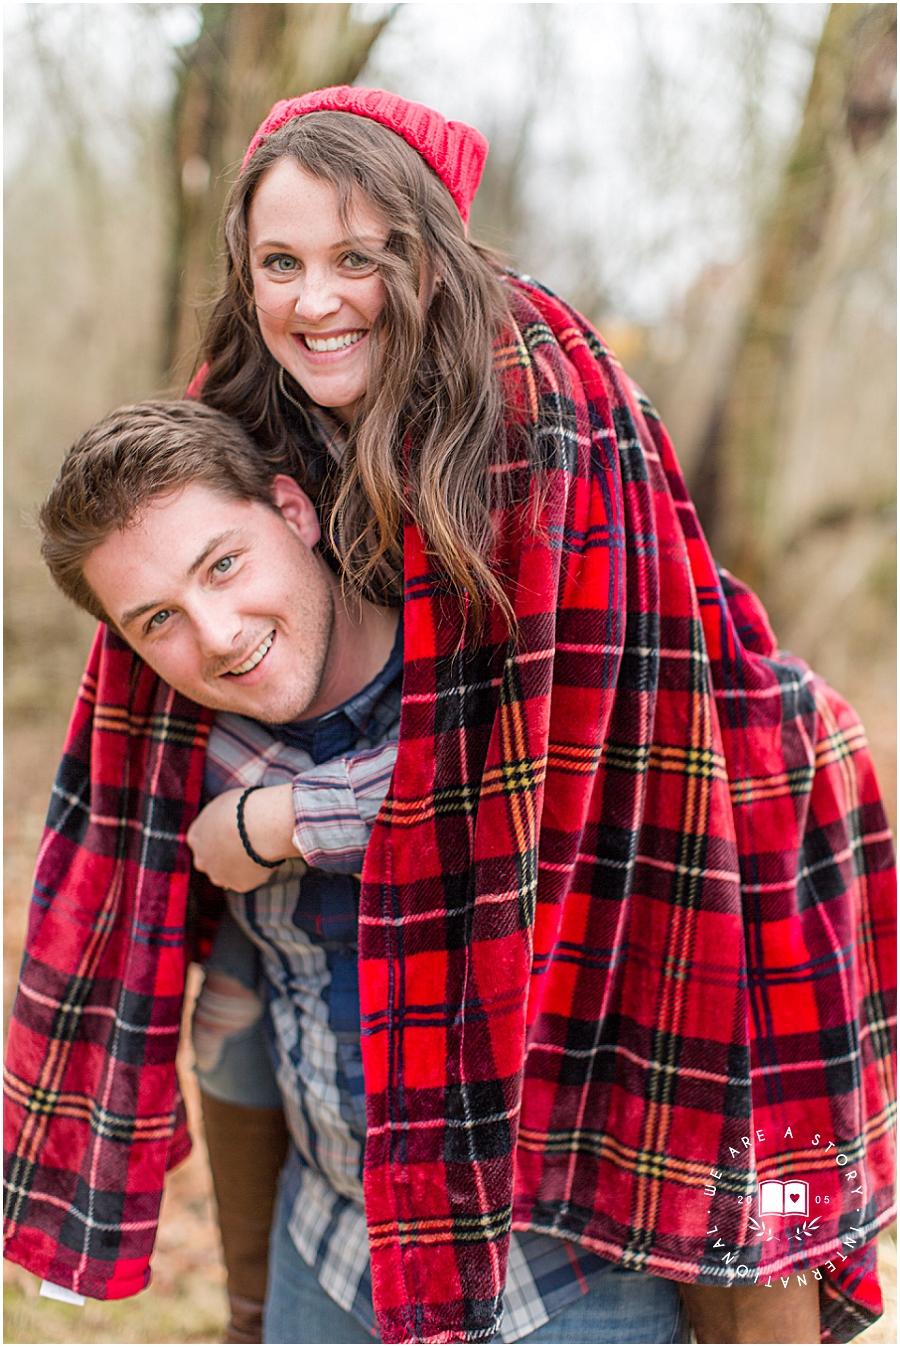 Cincinnati Wedding Photographer_We Are A Story_Molly & Matt Engagement Session_2553.jpg